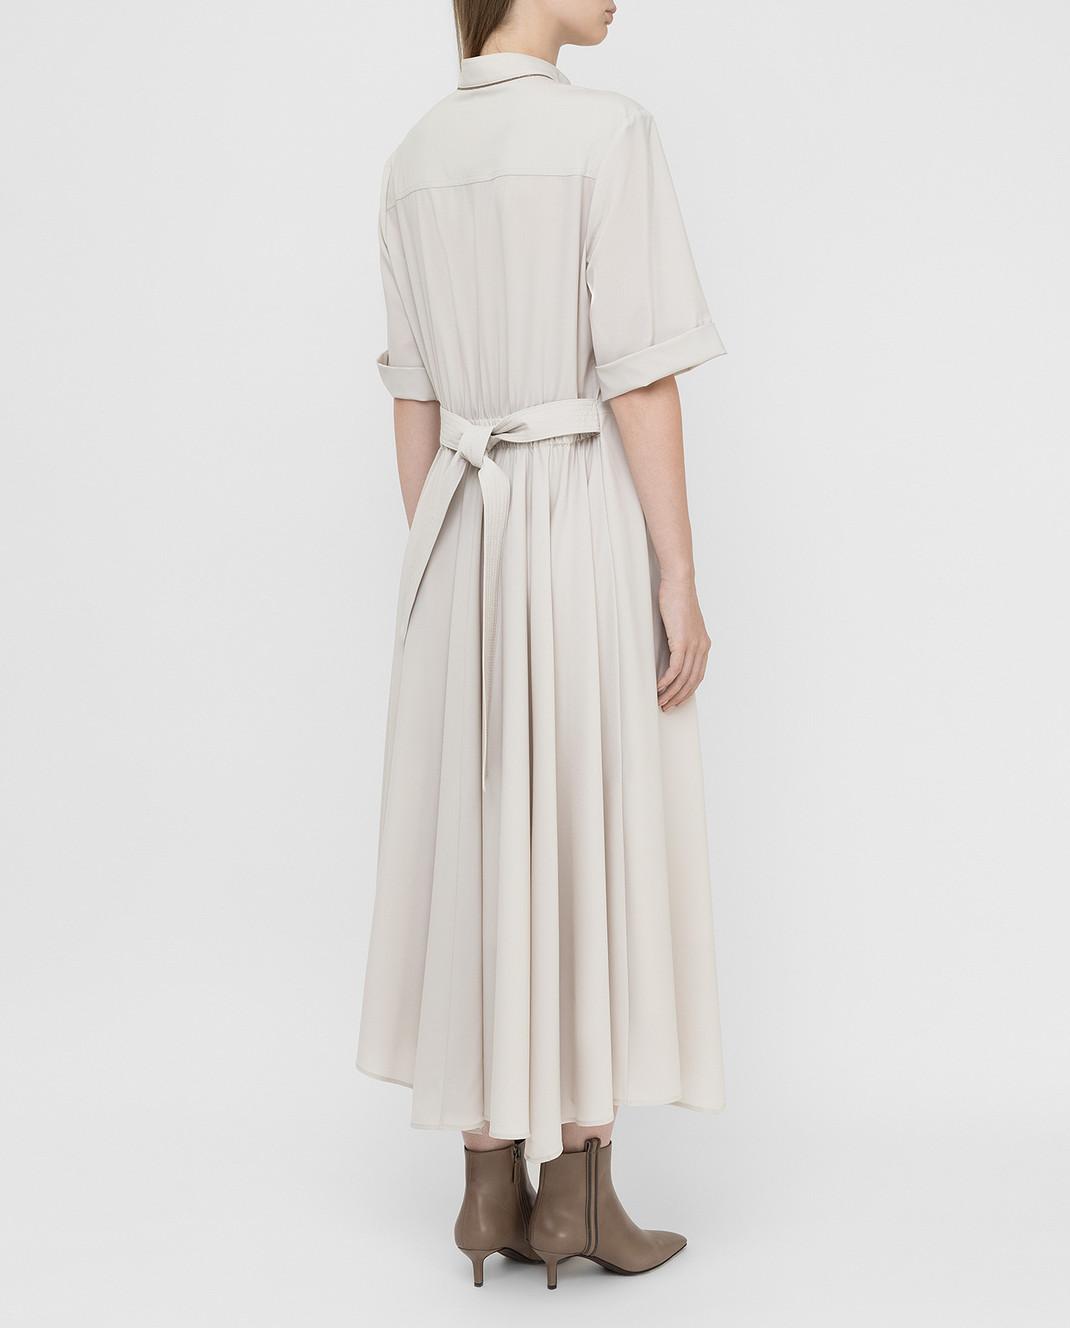 Brunello Cucinelli Светло-бежевое платье из шерсти изображение 4